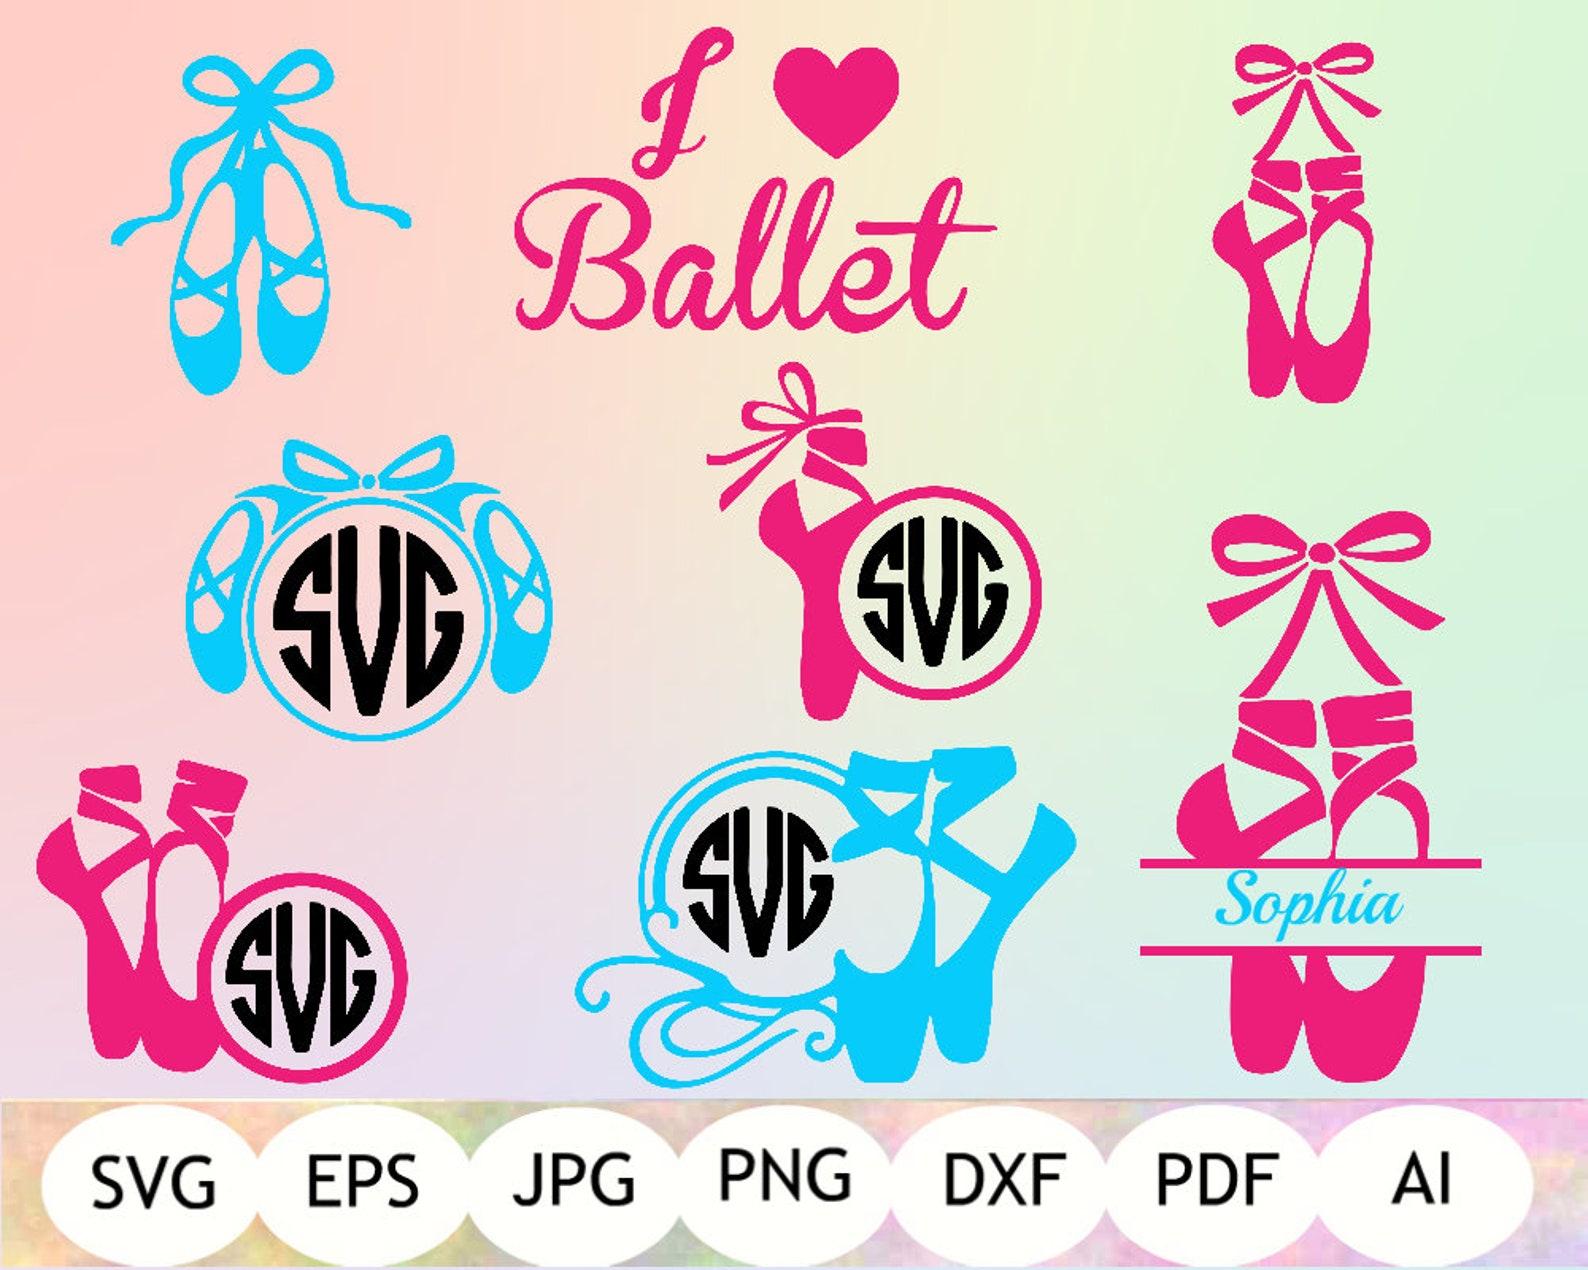 ballet monogram svg, ballet shoes svg, ballerina cut file, i love ballet clipart, silhouette cameo, cricut, instant download